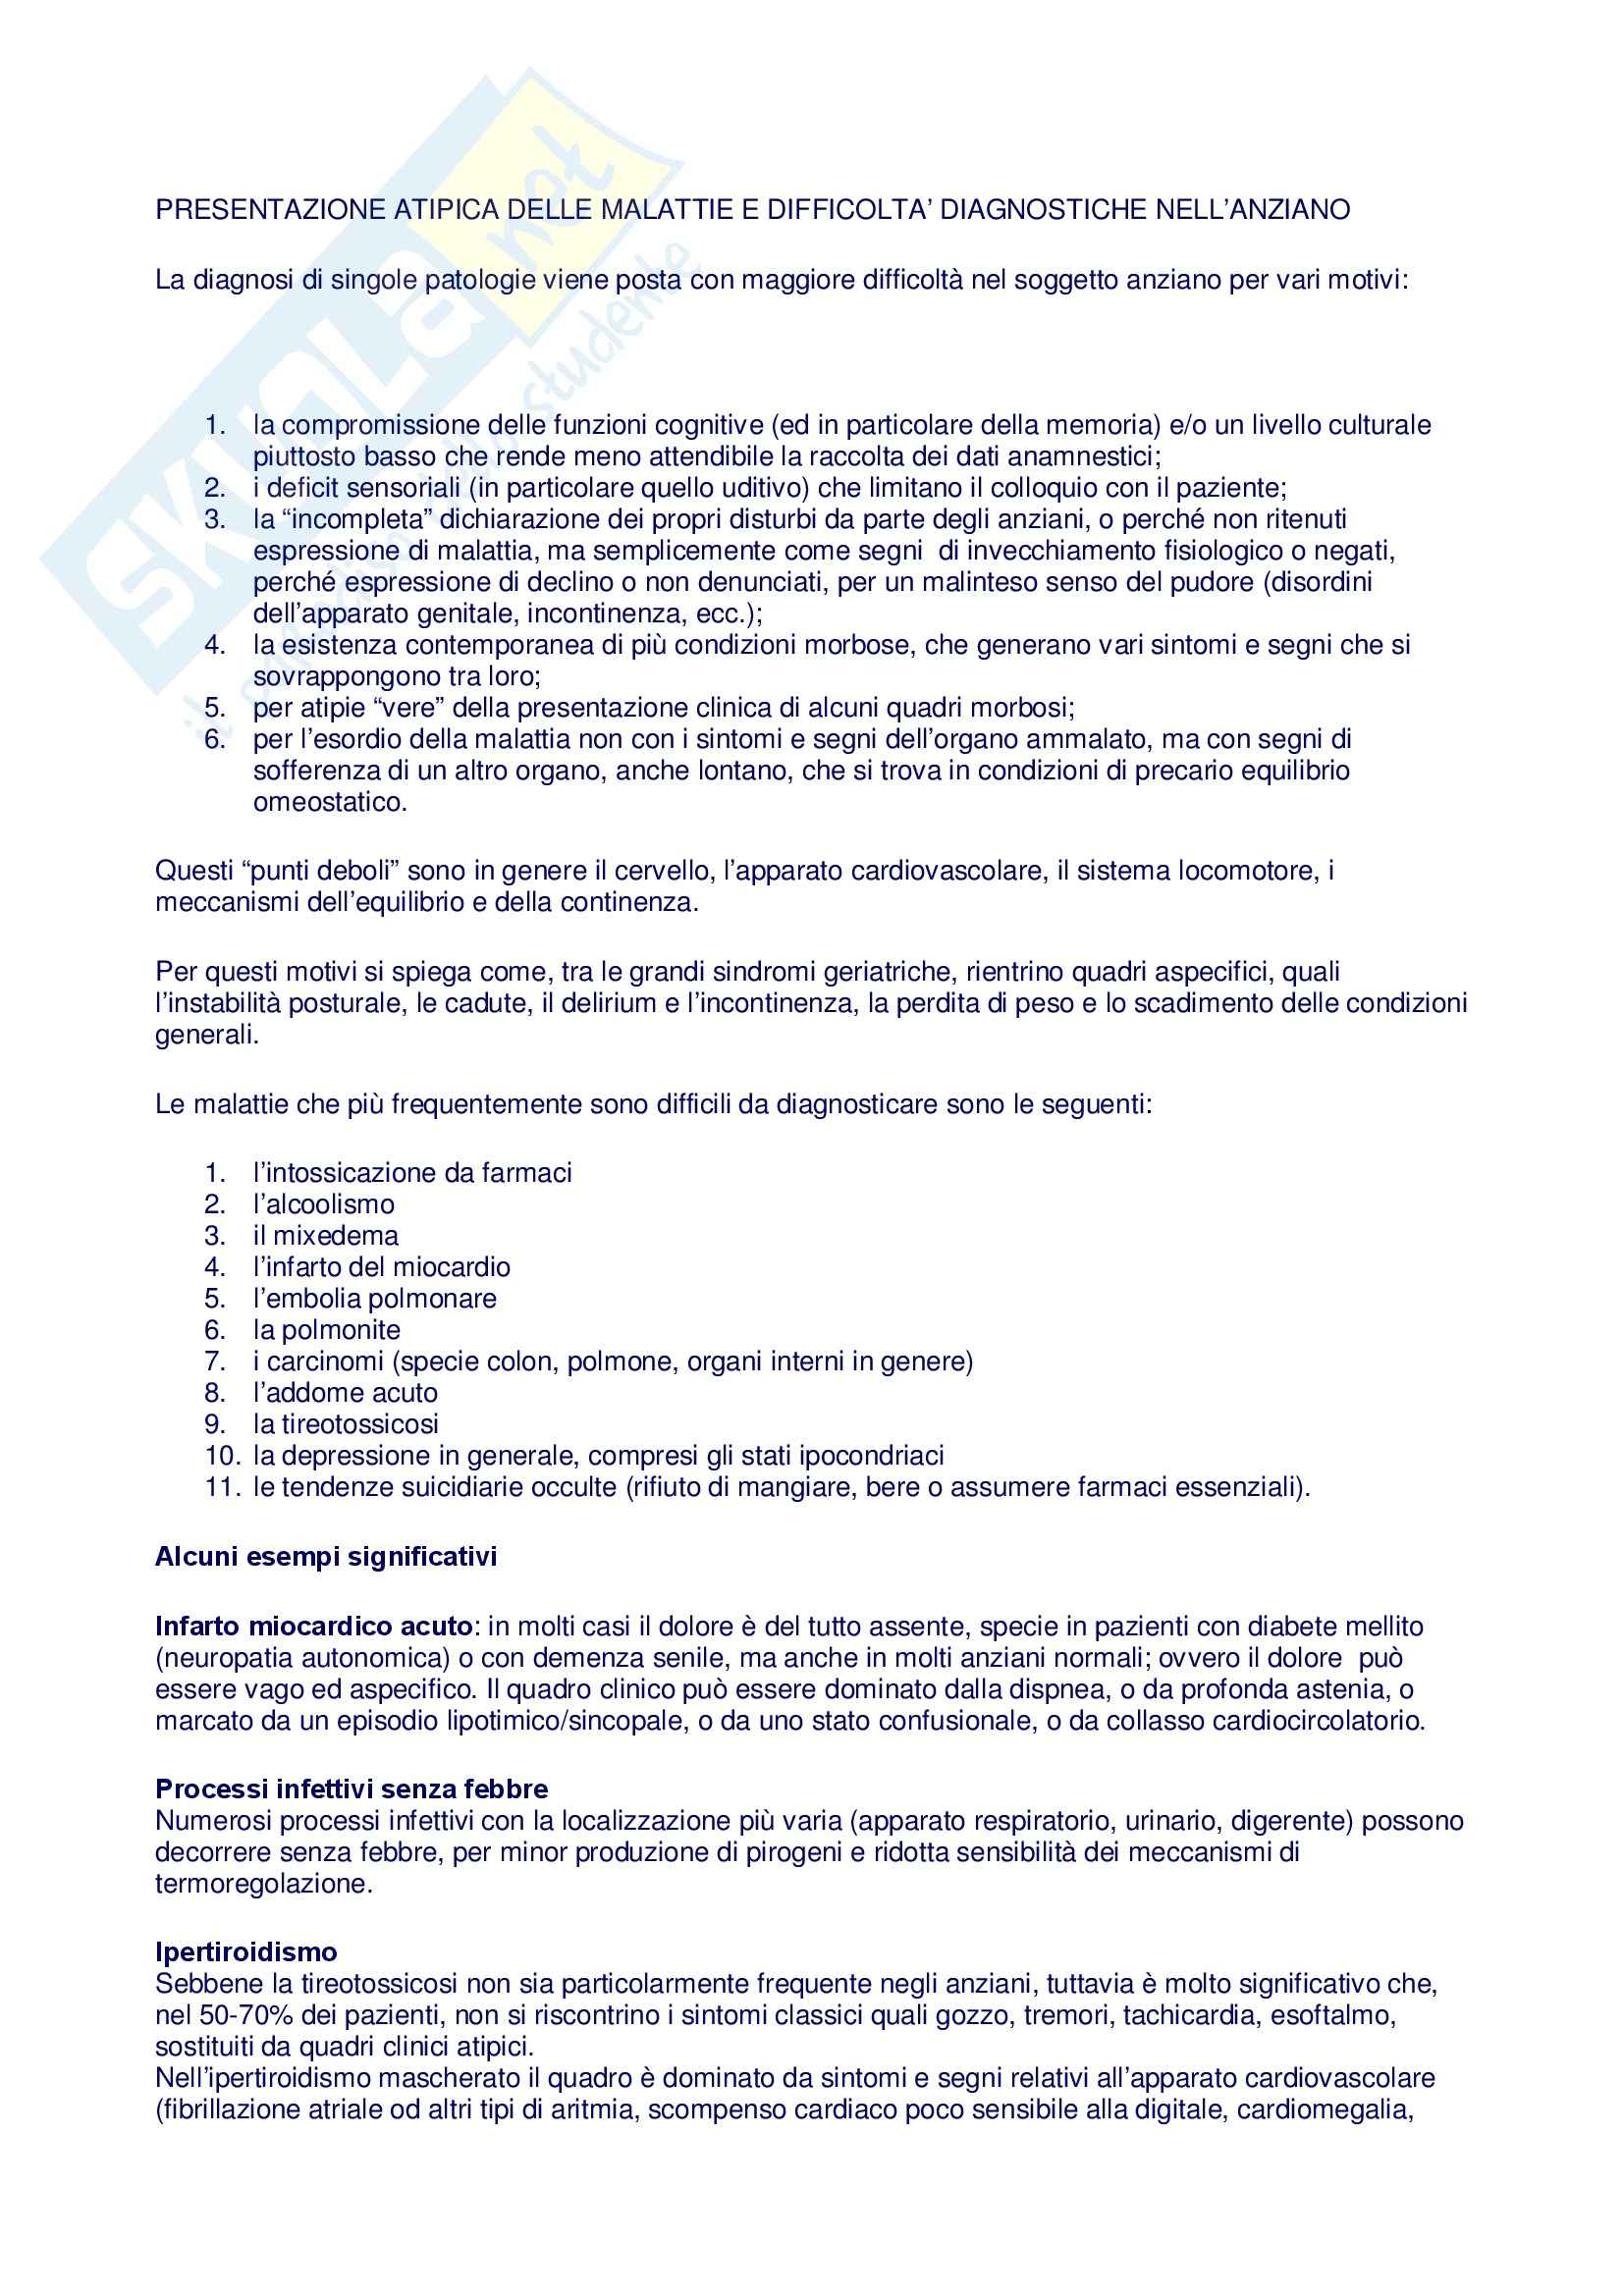 Geriatria-Patologie geriatriche